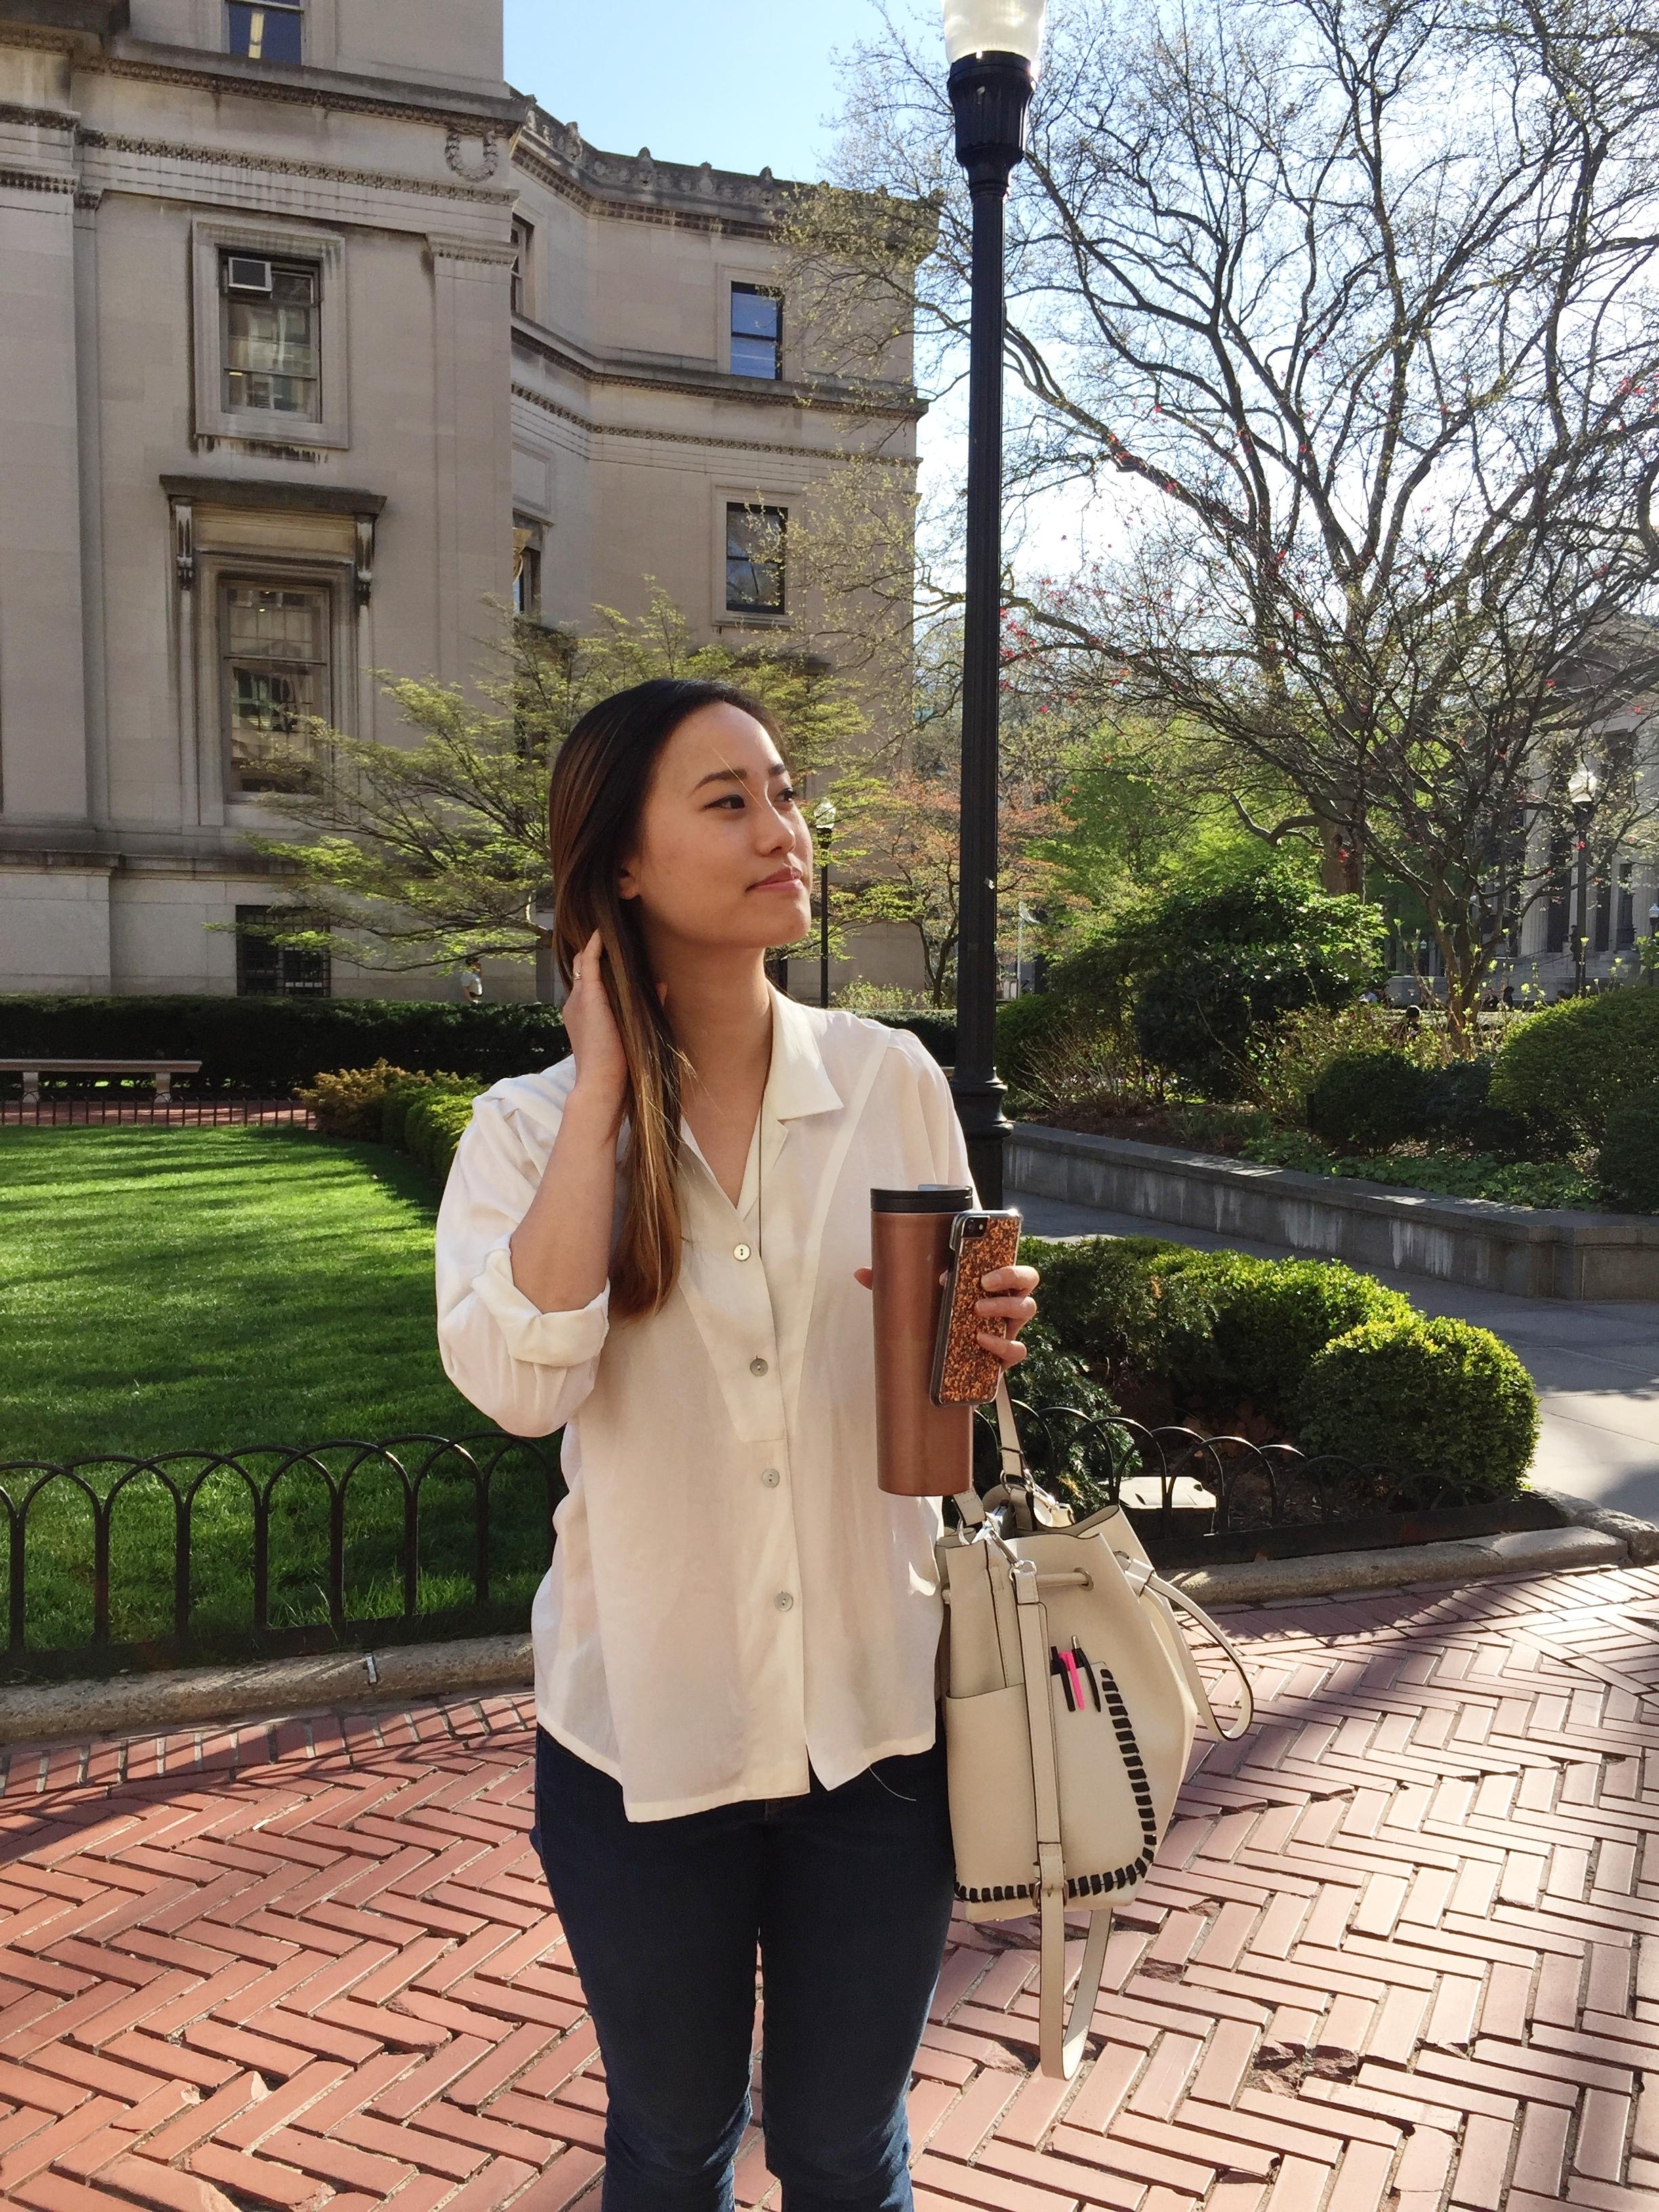 Michelle at Columbia University